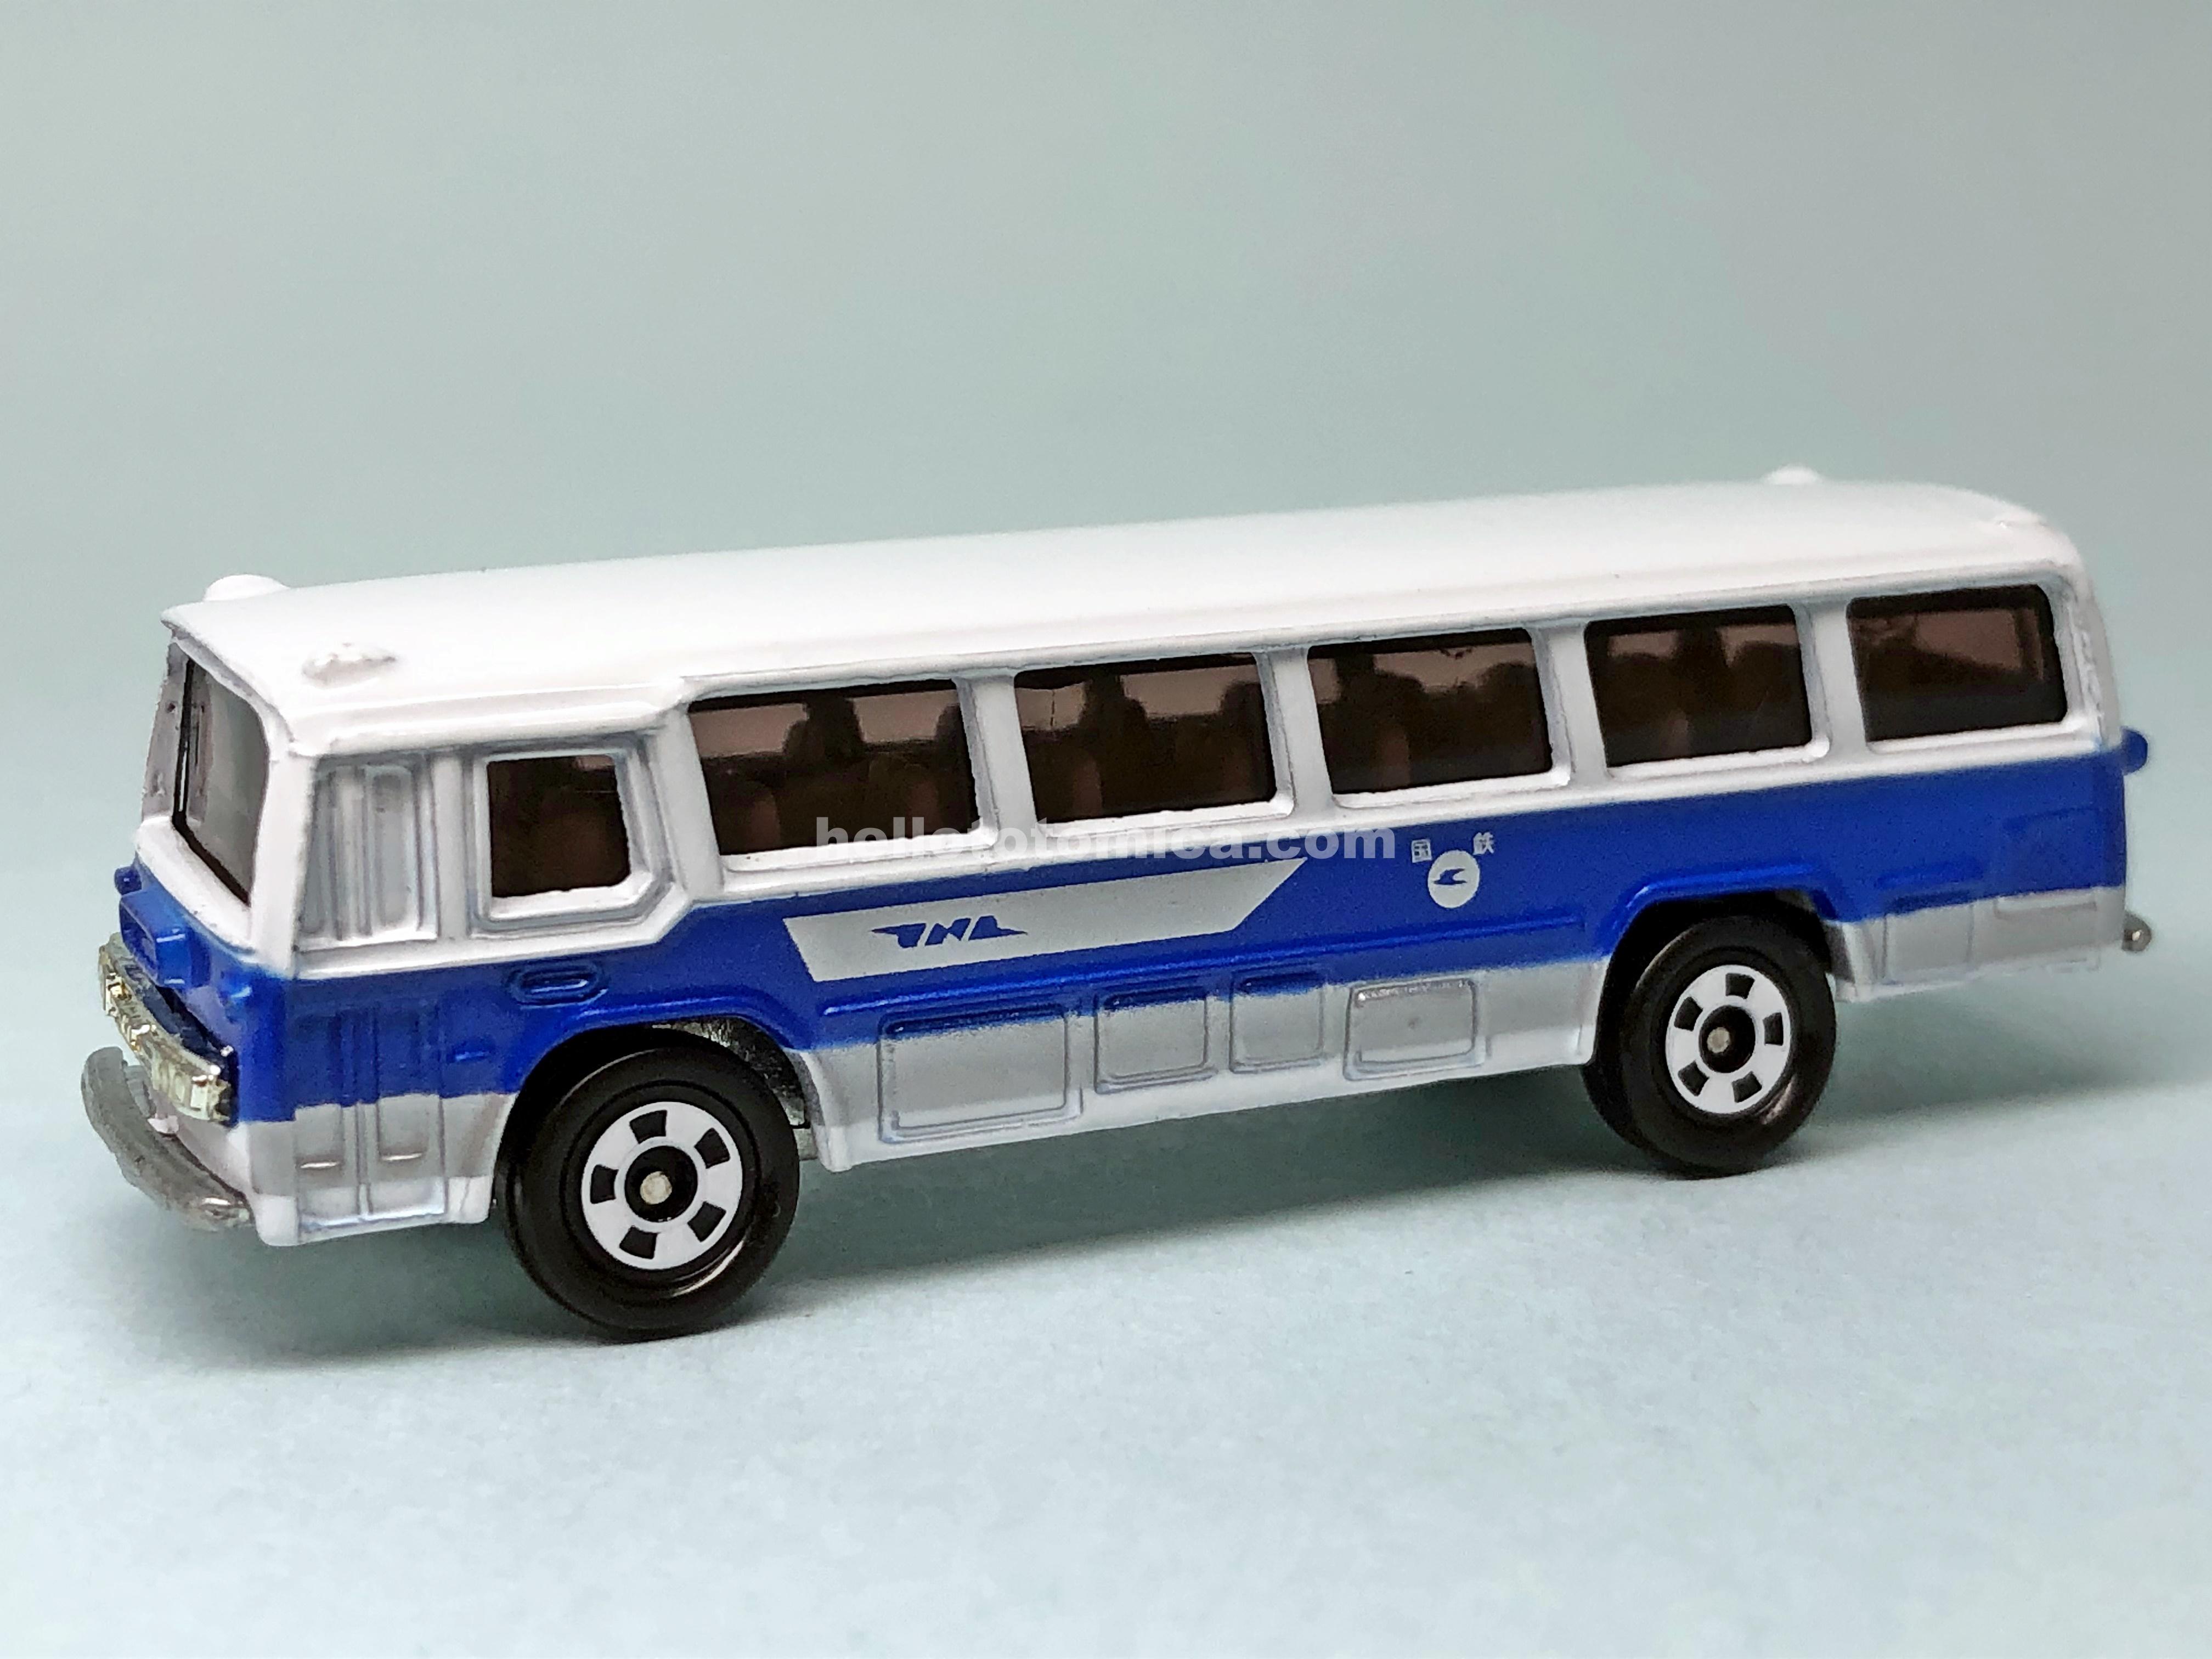 41-1 MITSUBISHI FUSO HIGHWAY BUS